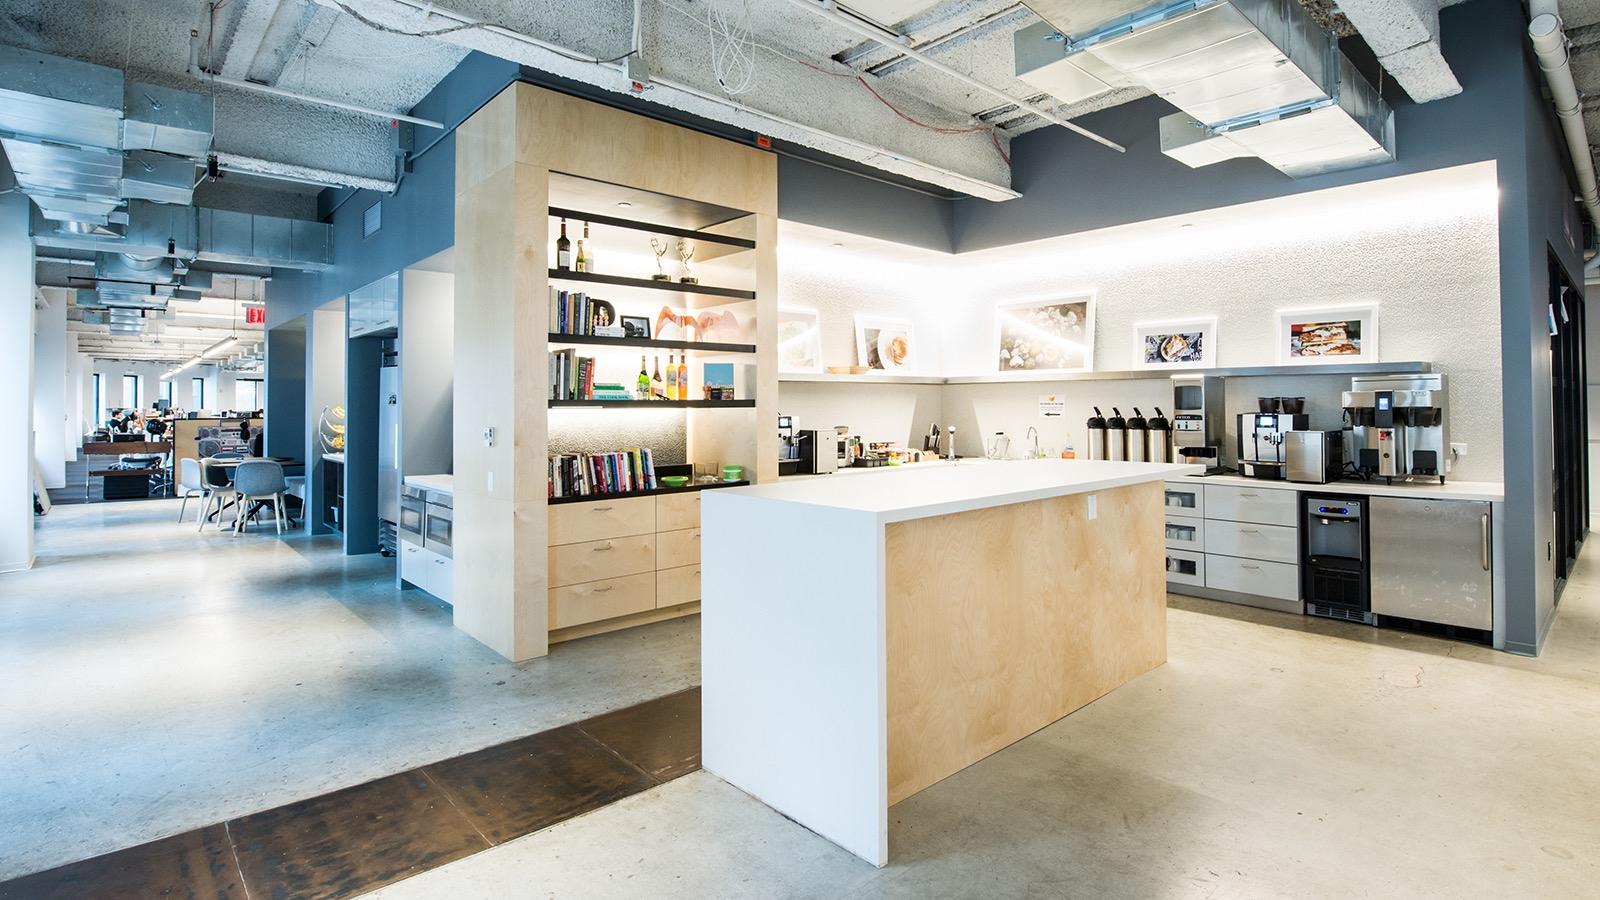 vox-media-nyc-office-16